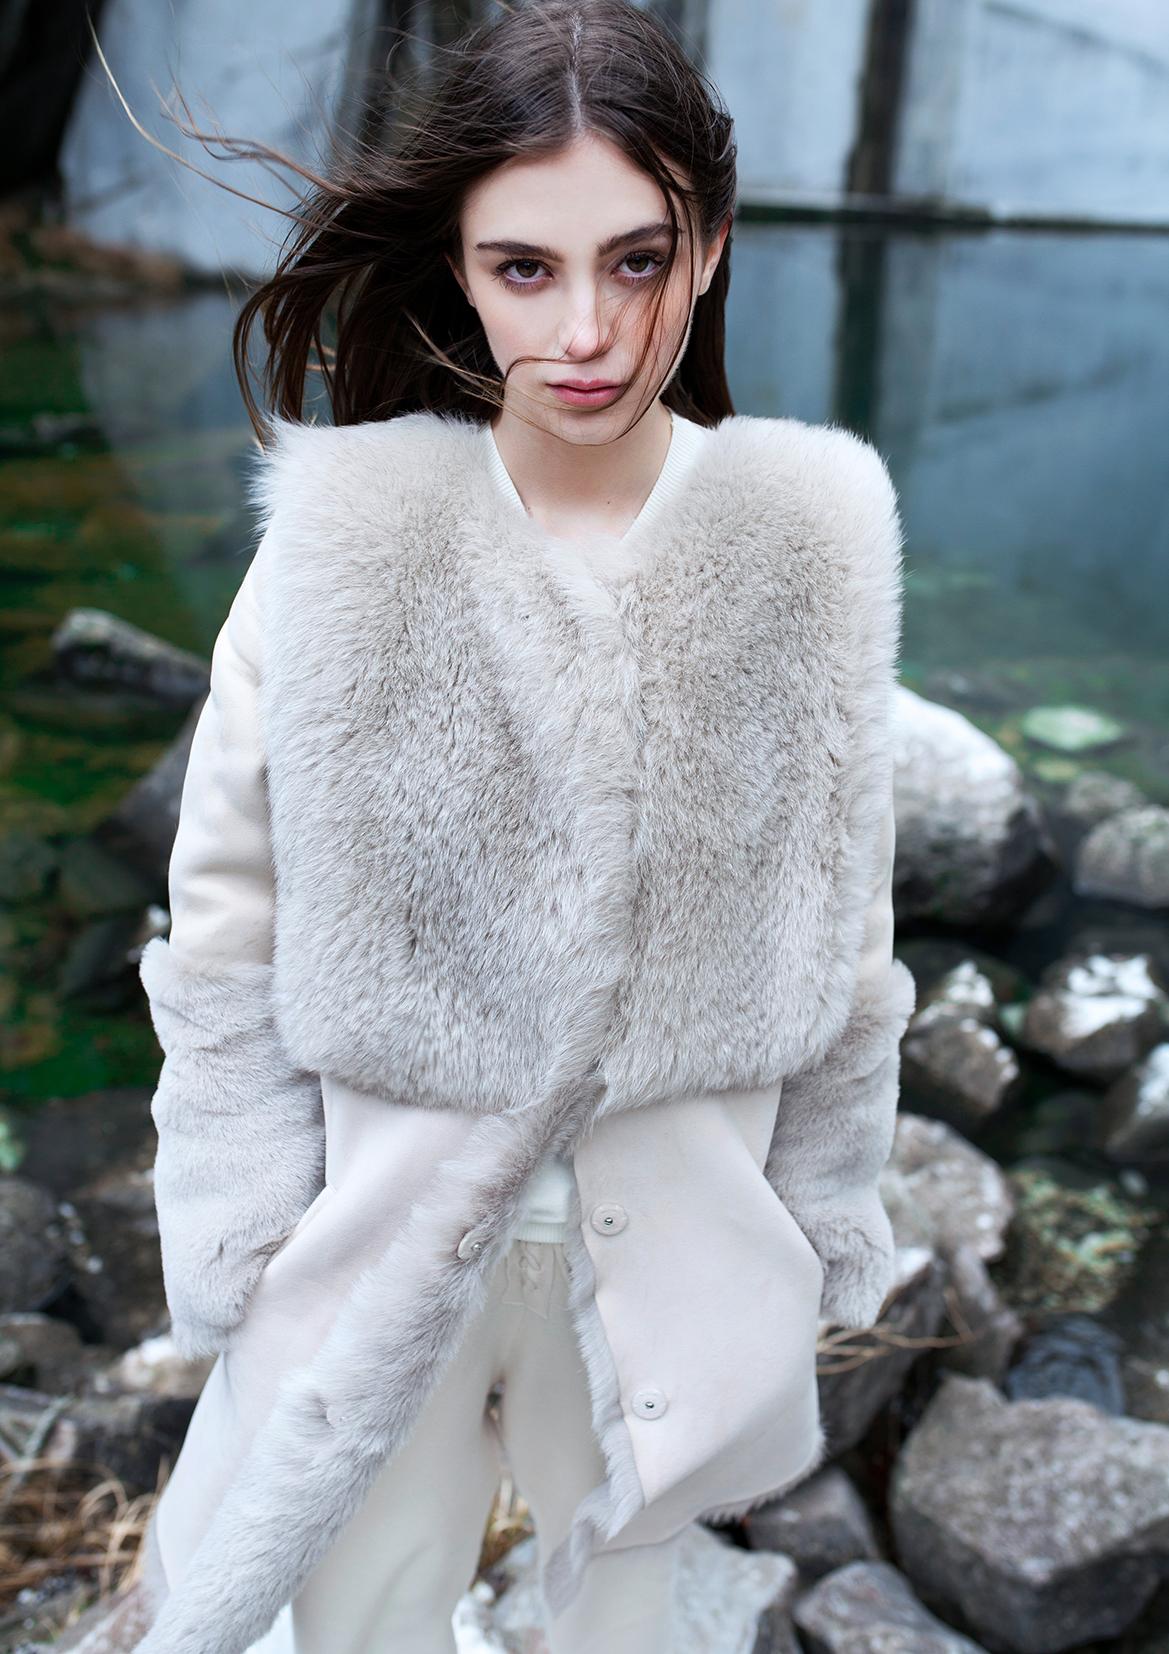 Lisa Contè